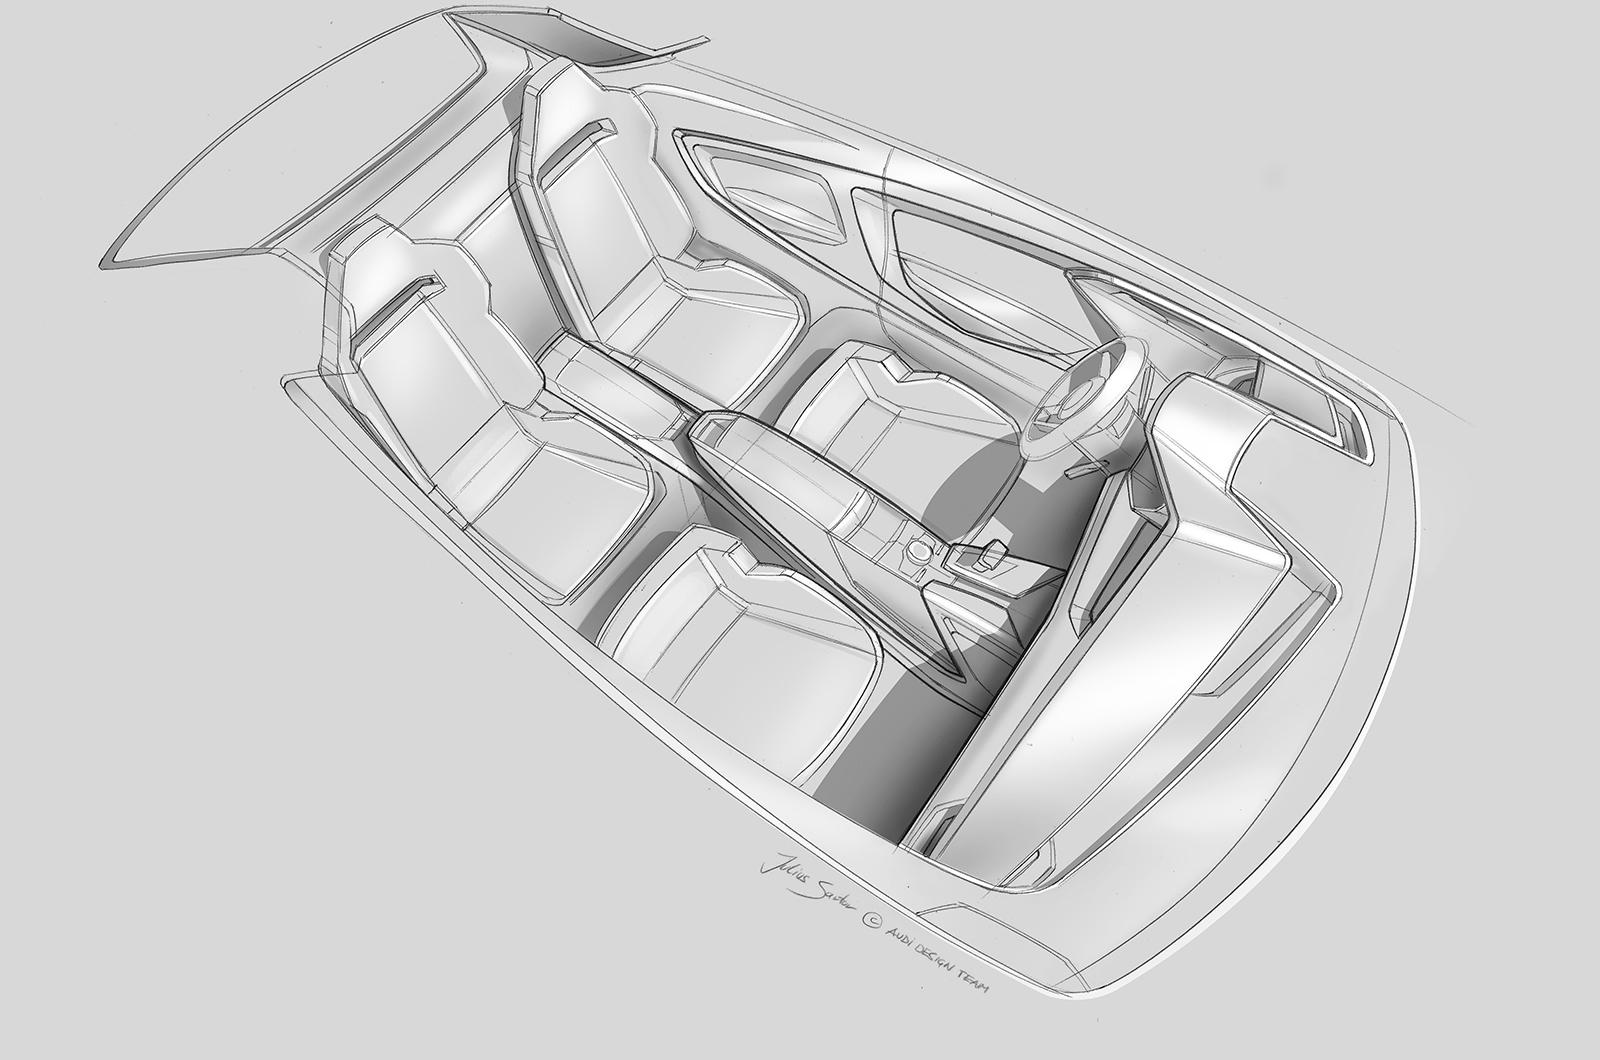 audi cars news 2013 quattro concept heads to frankfurt. Black Bedroom Furniture Sets. Home Design Ideas